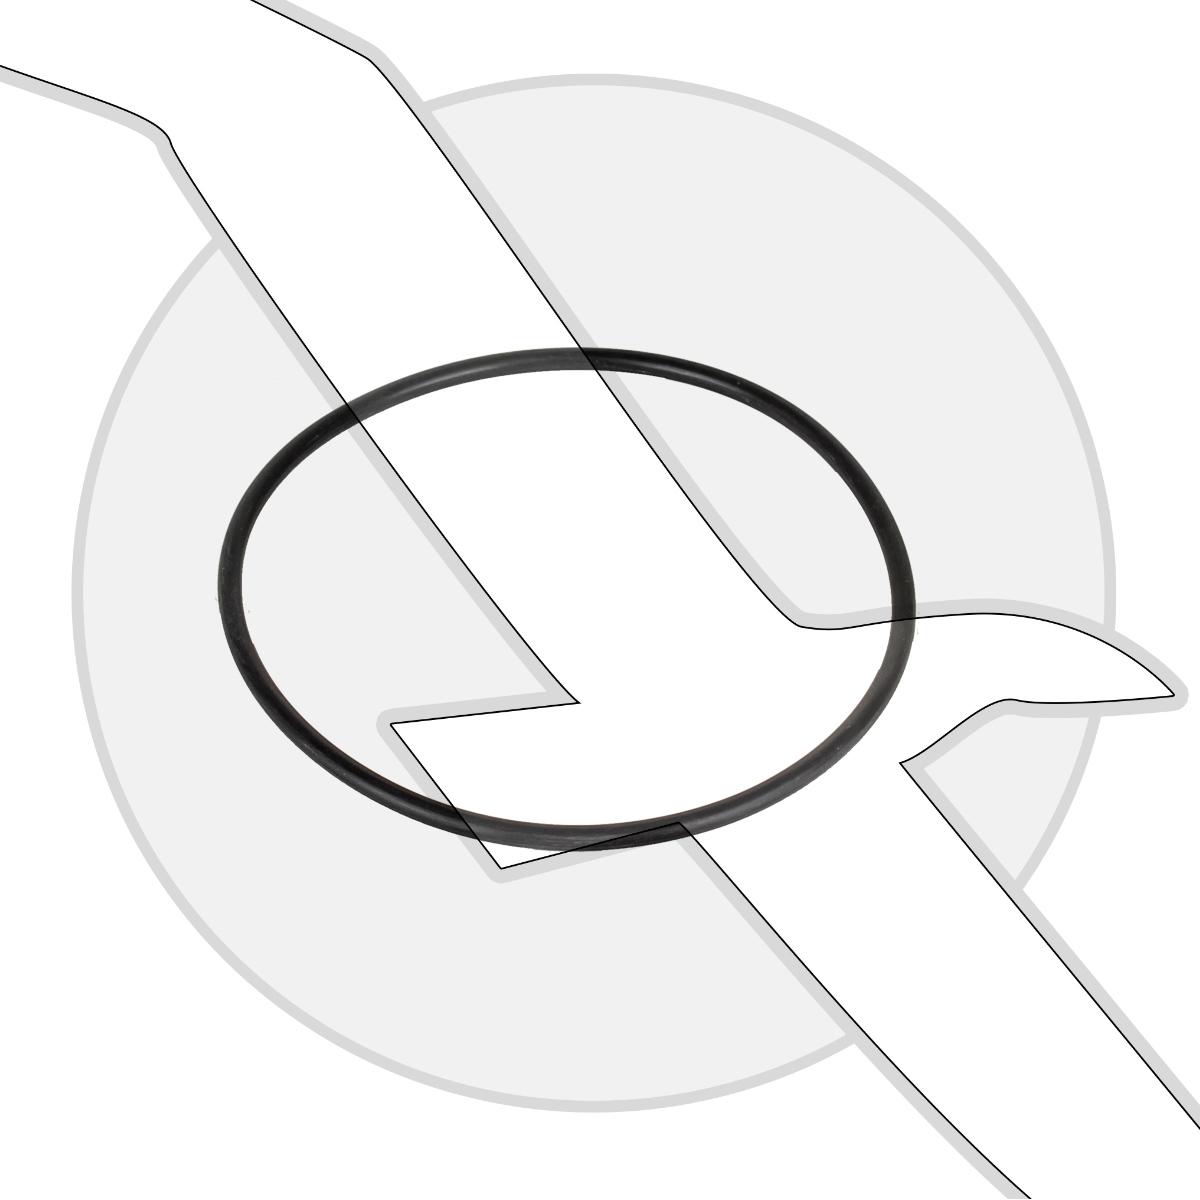 New Mercury Mercruiser Quicksilver OEM Part # 25-861844 O RING